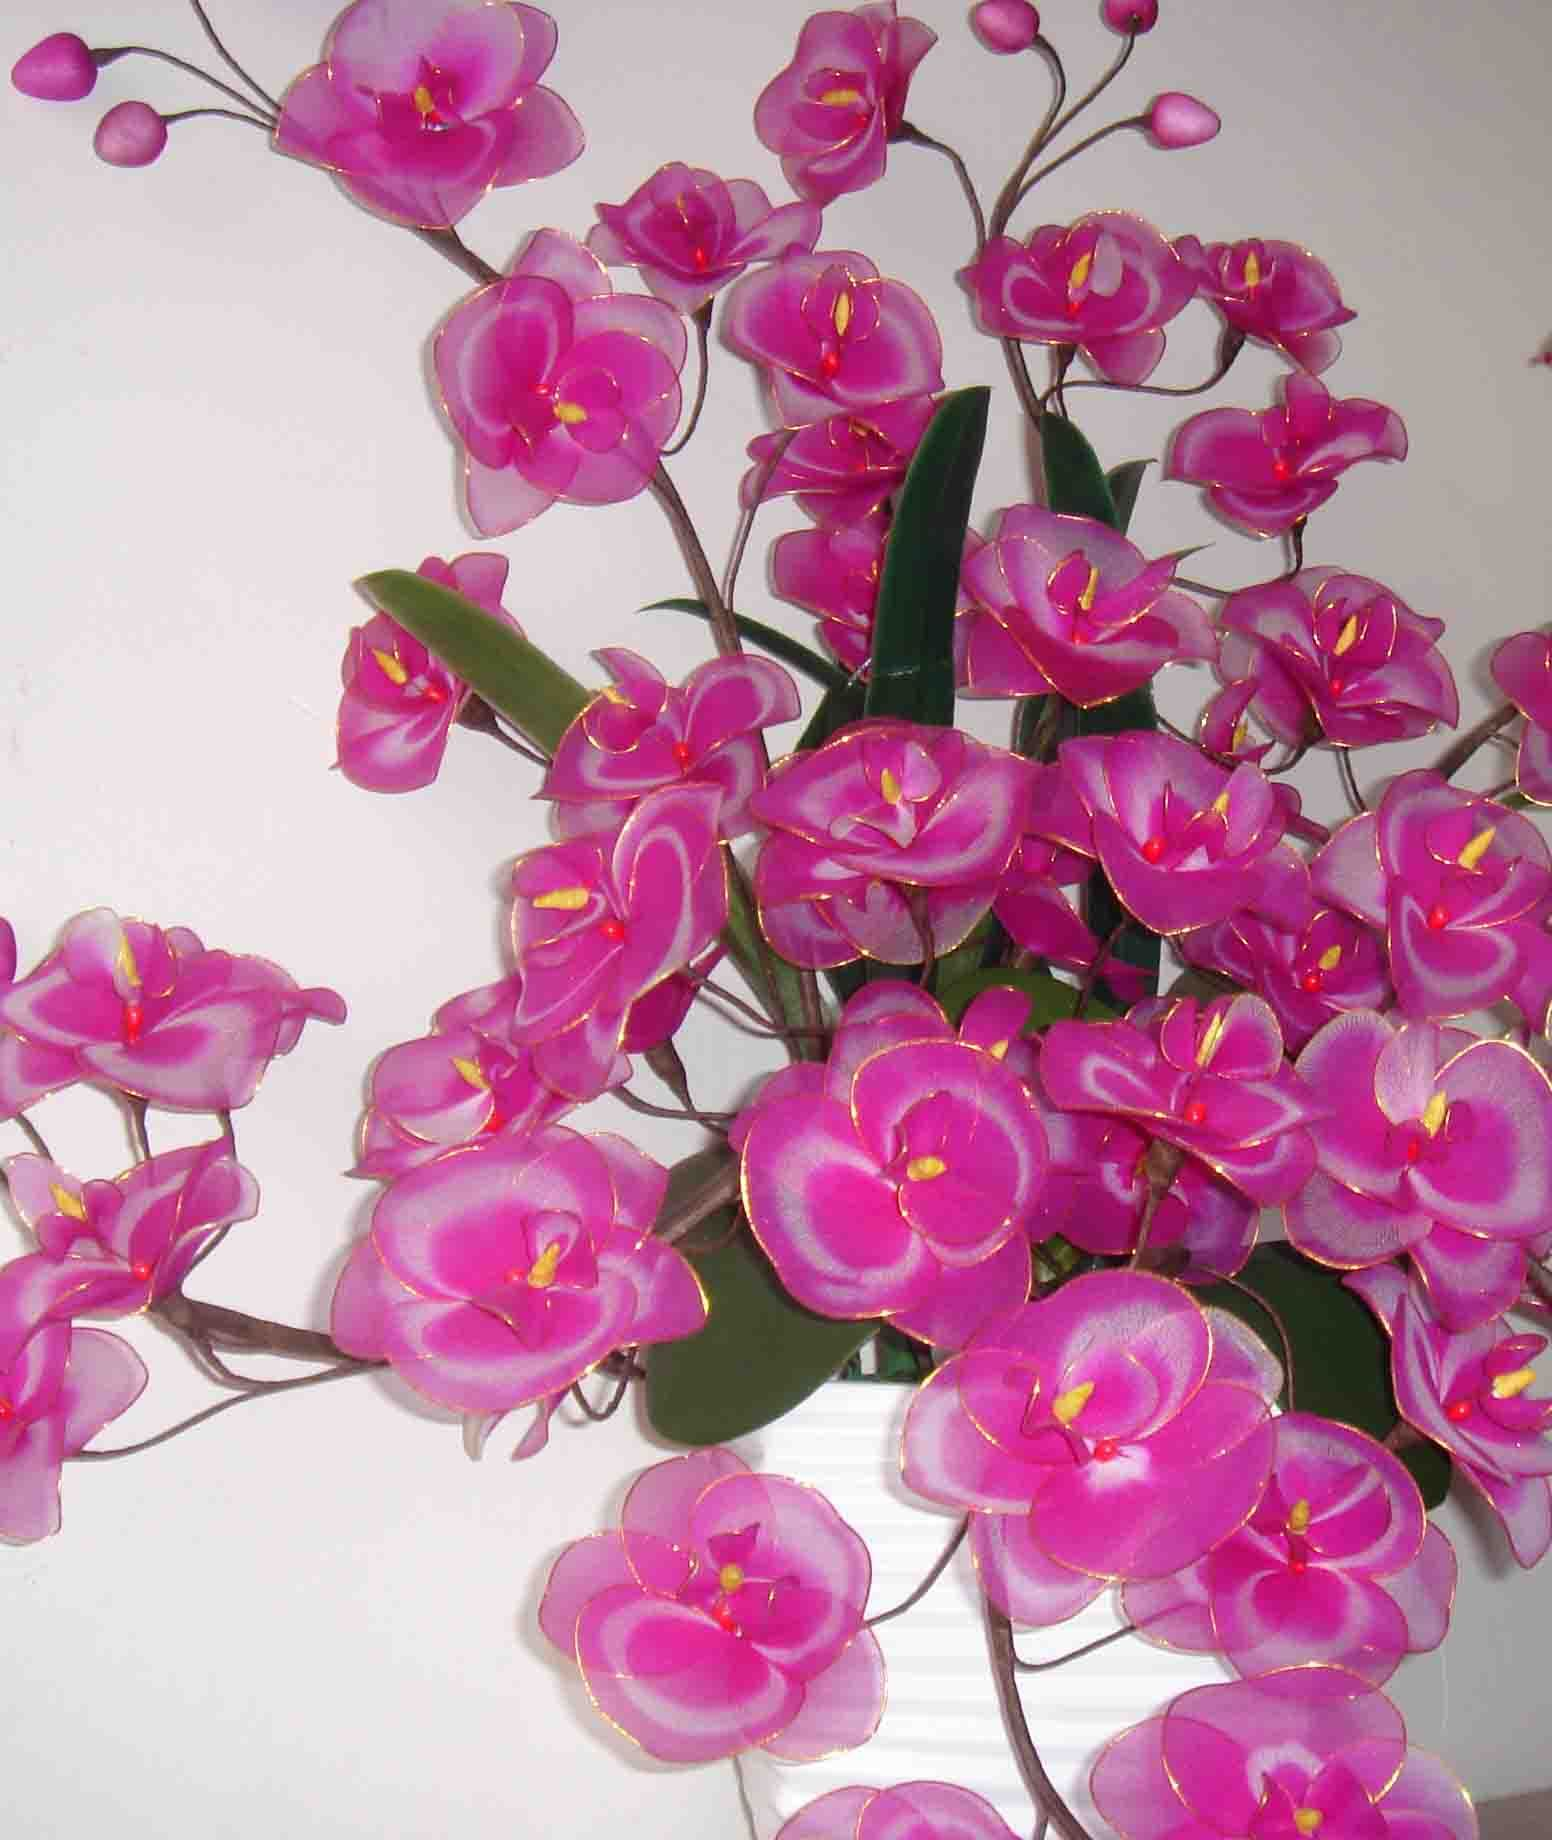 Другие материалы Huahua mothers handmade flower square 80 through my own eyes – single mothers